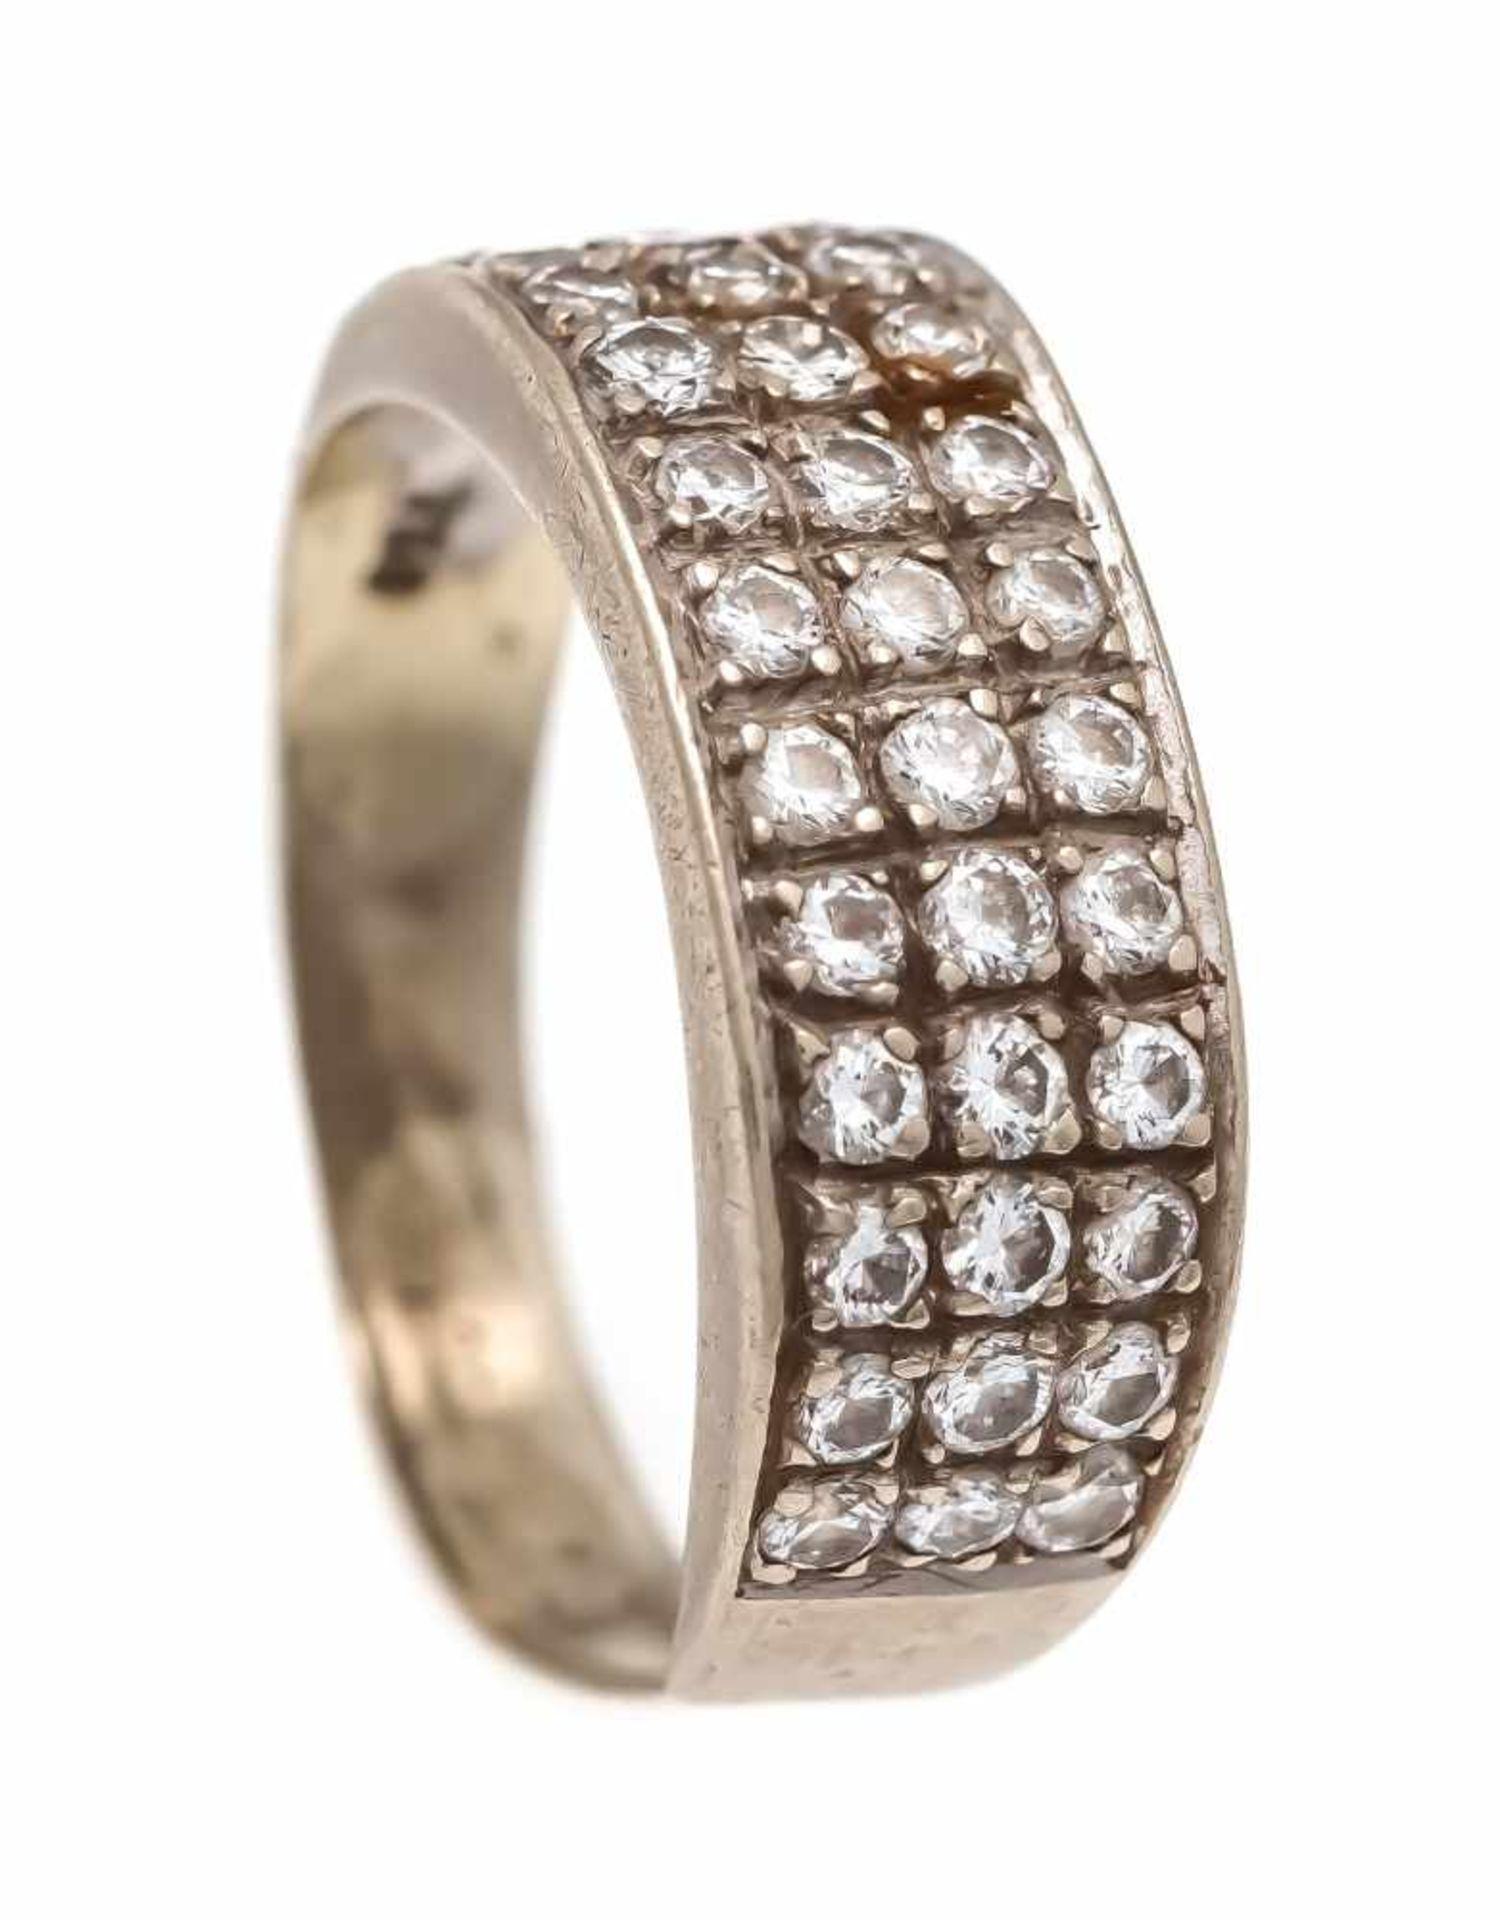 Brillant-Ring WG 750/000 mit 36 Brillanten, zus. 0,50 ct W/SI, RG 55, 4,2 gBrilliant ring WG 750/000